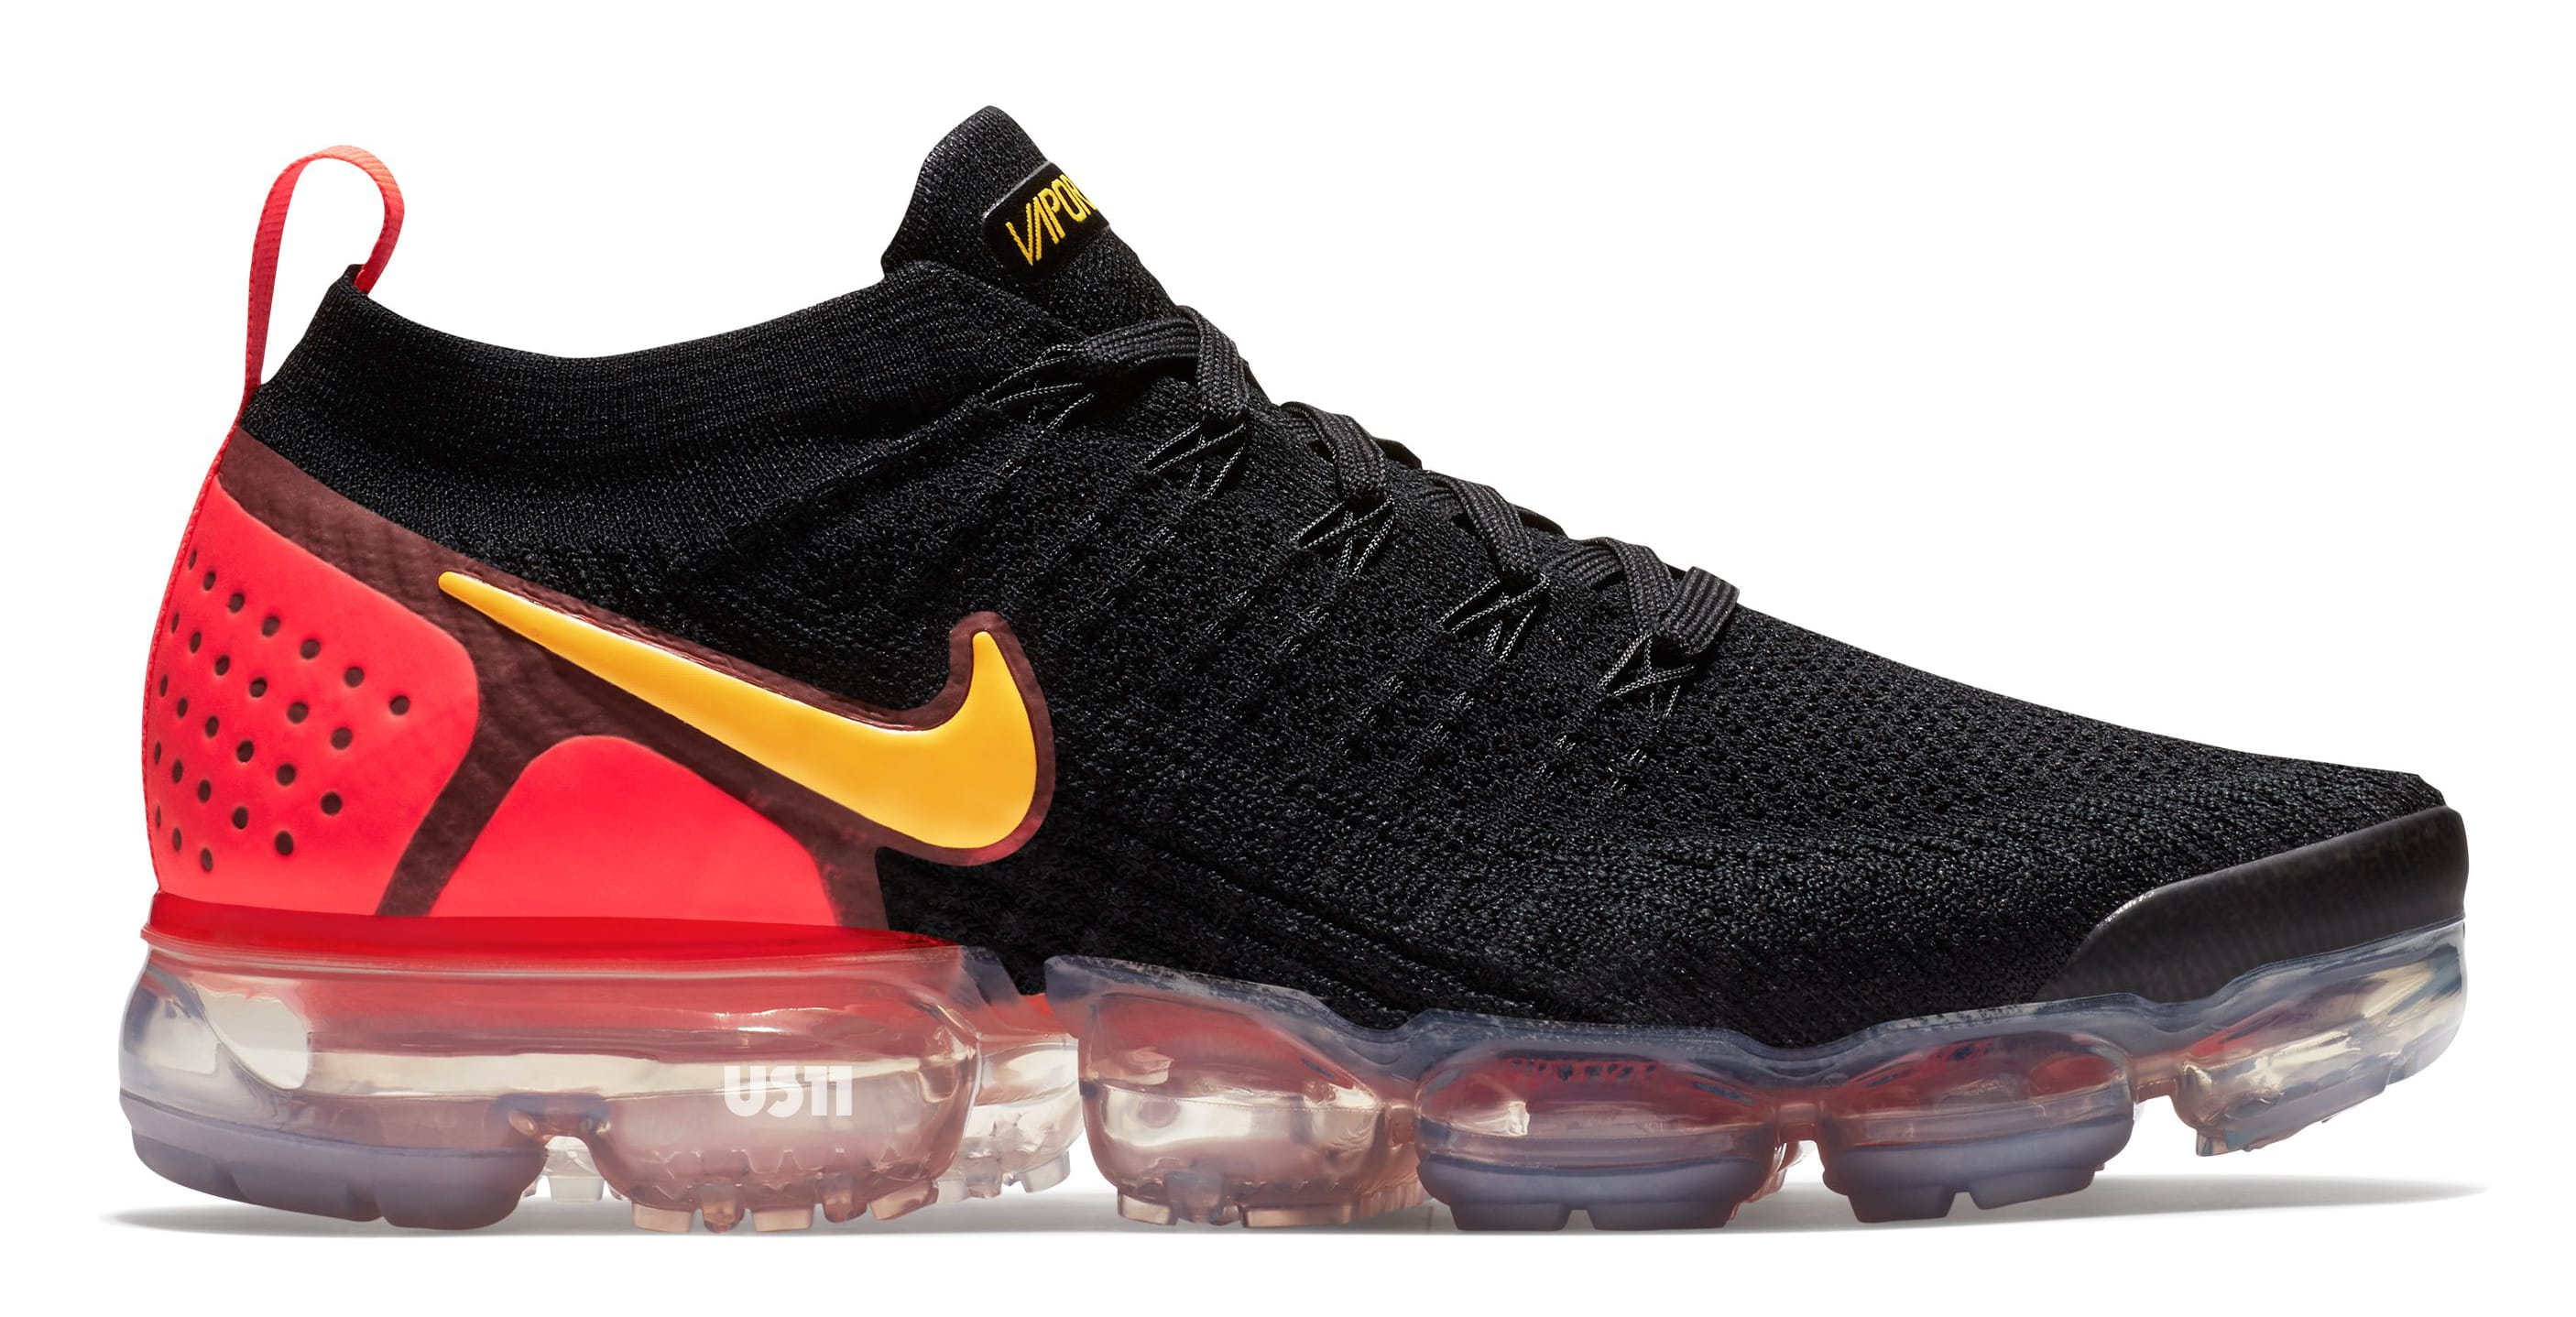 Nike Air VaporMax 2.0 Black/Yellow/Red